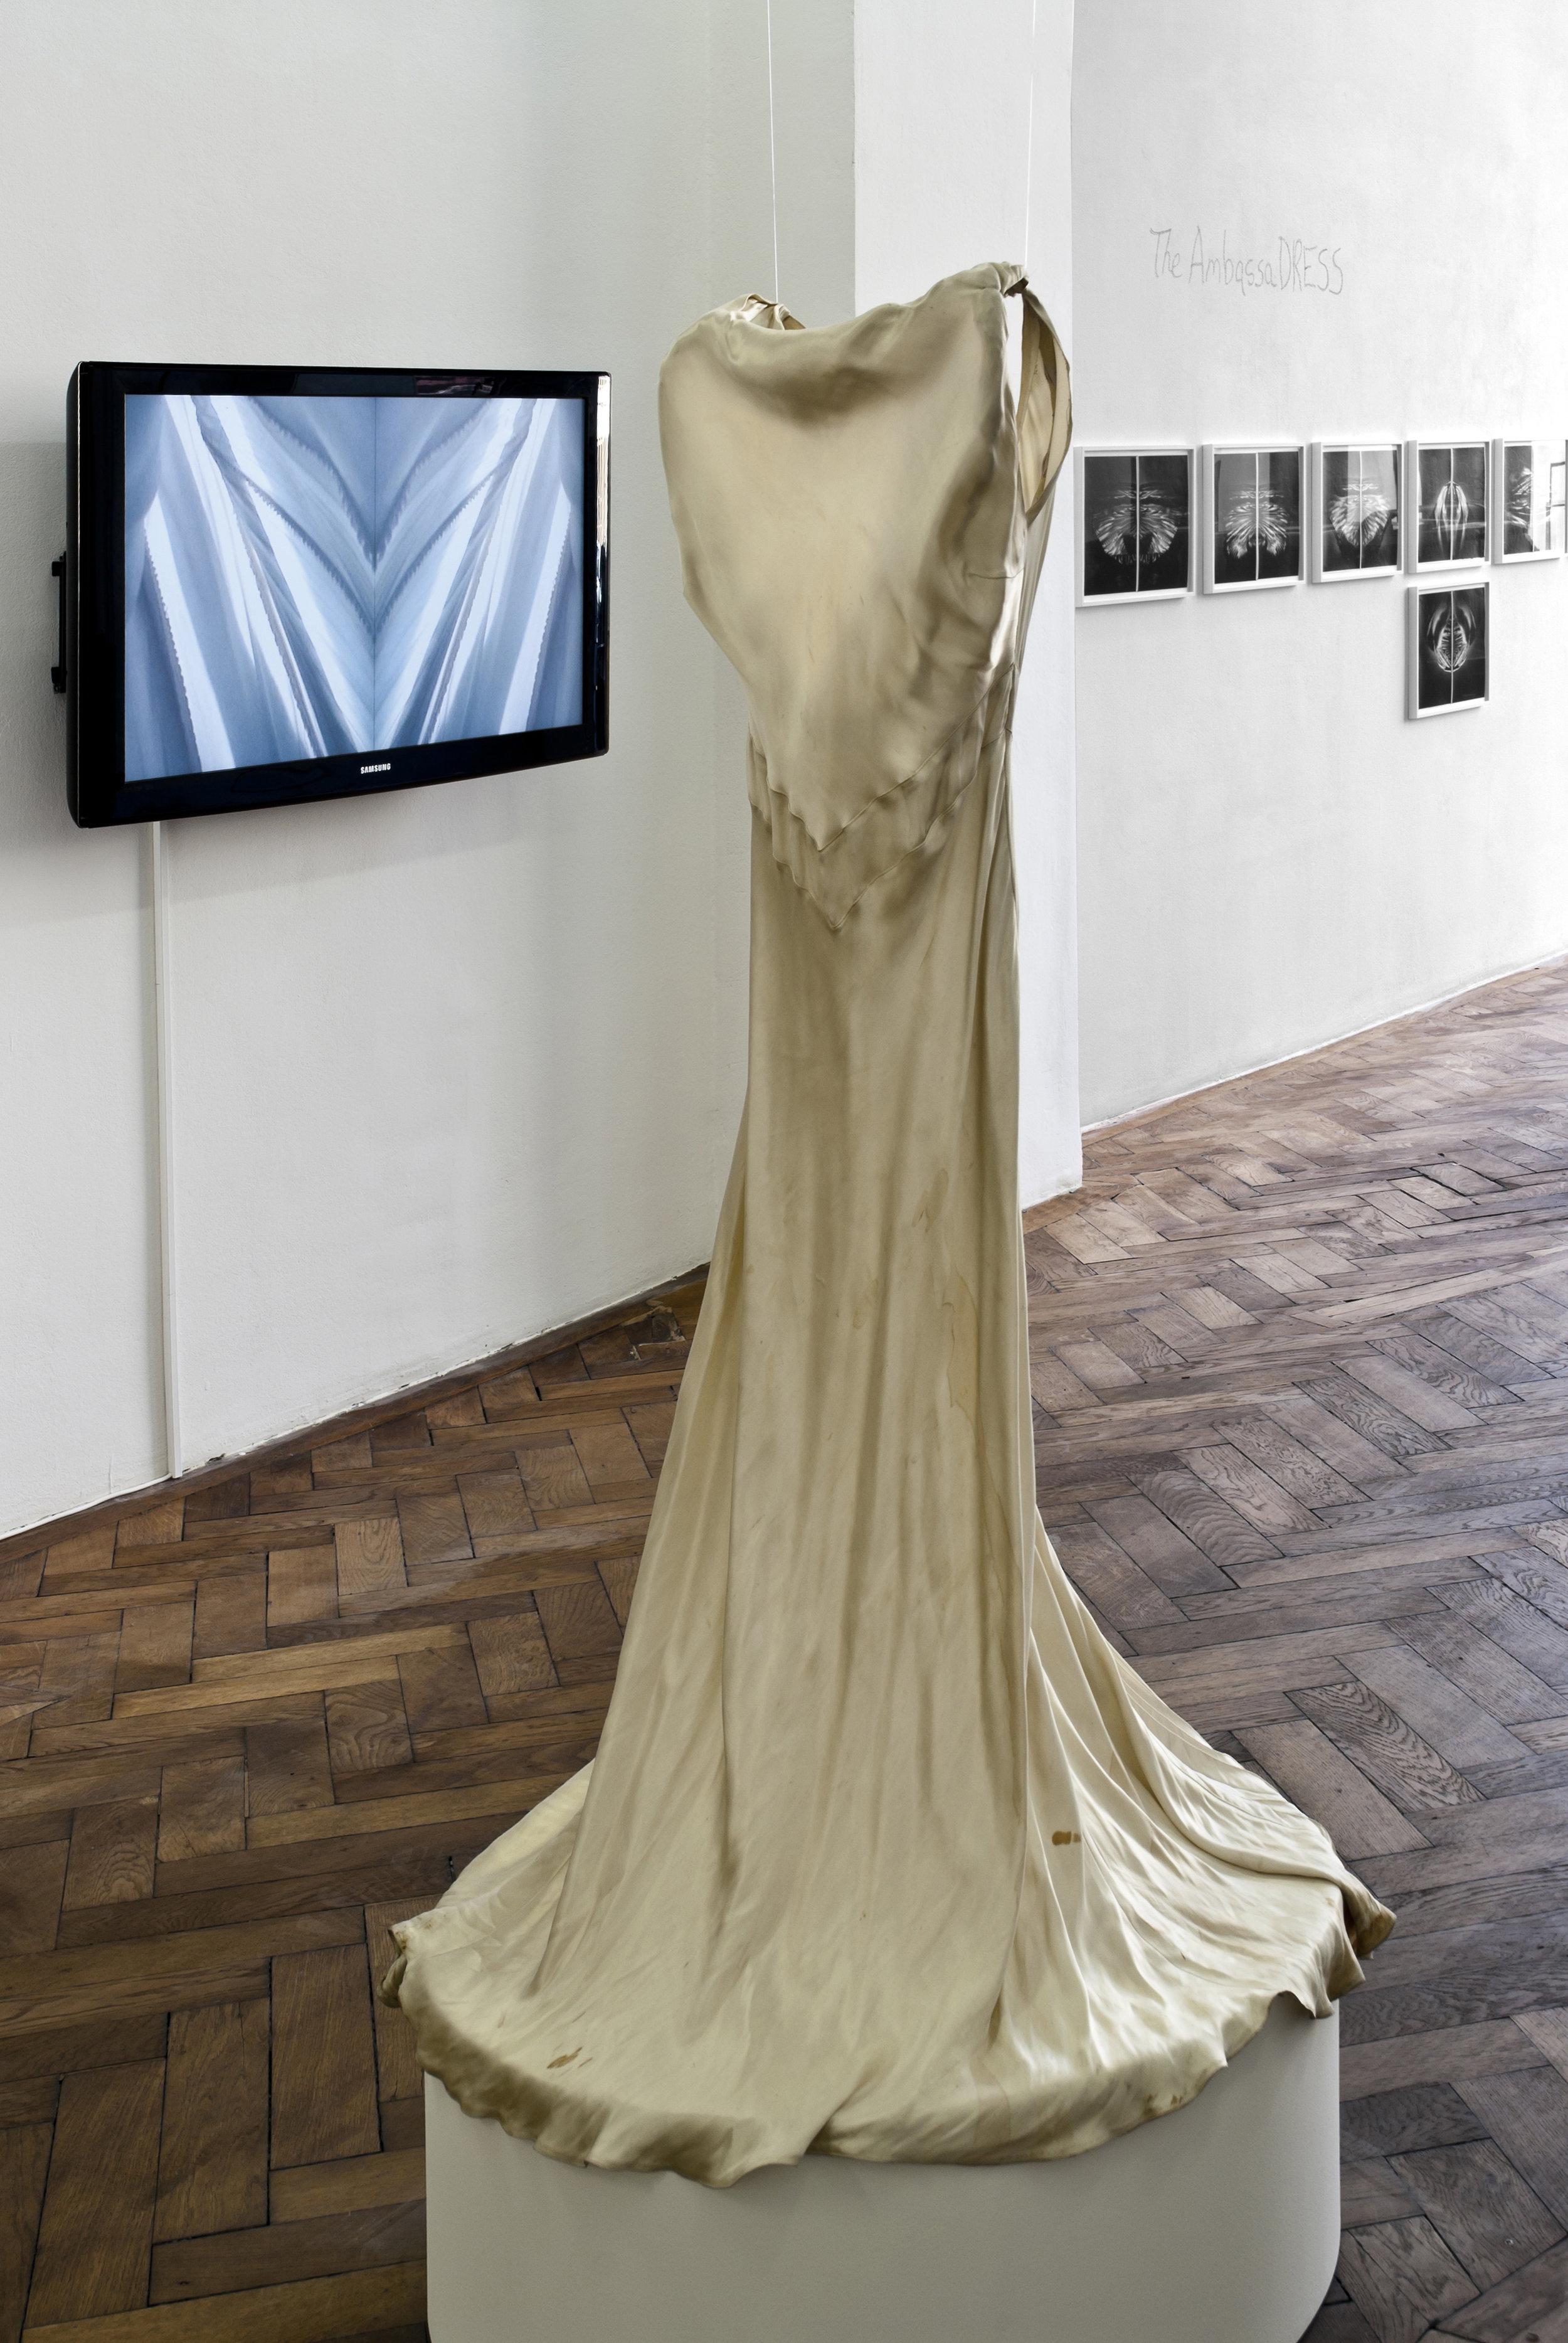 Exhibition View, Galerie Hubert Winter, curated by_Derya Yücel, 2011, Photo: Karl Kühn